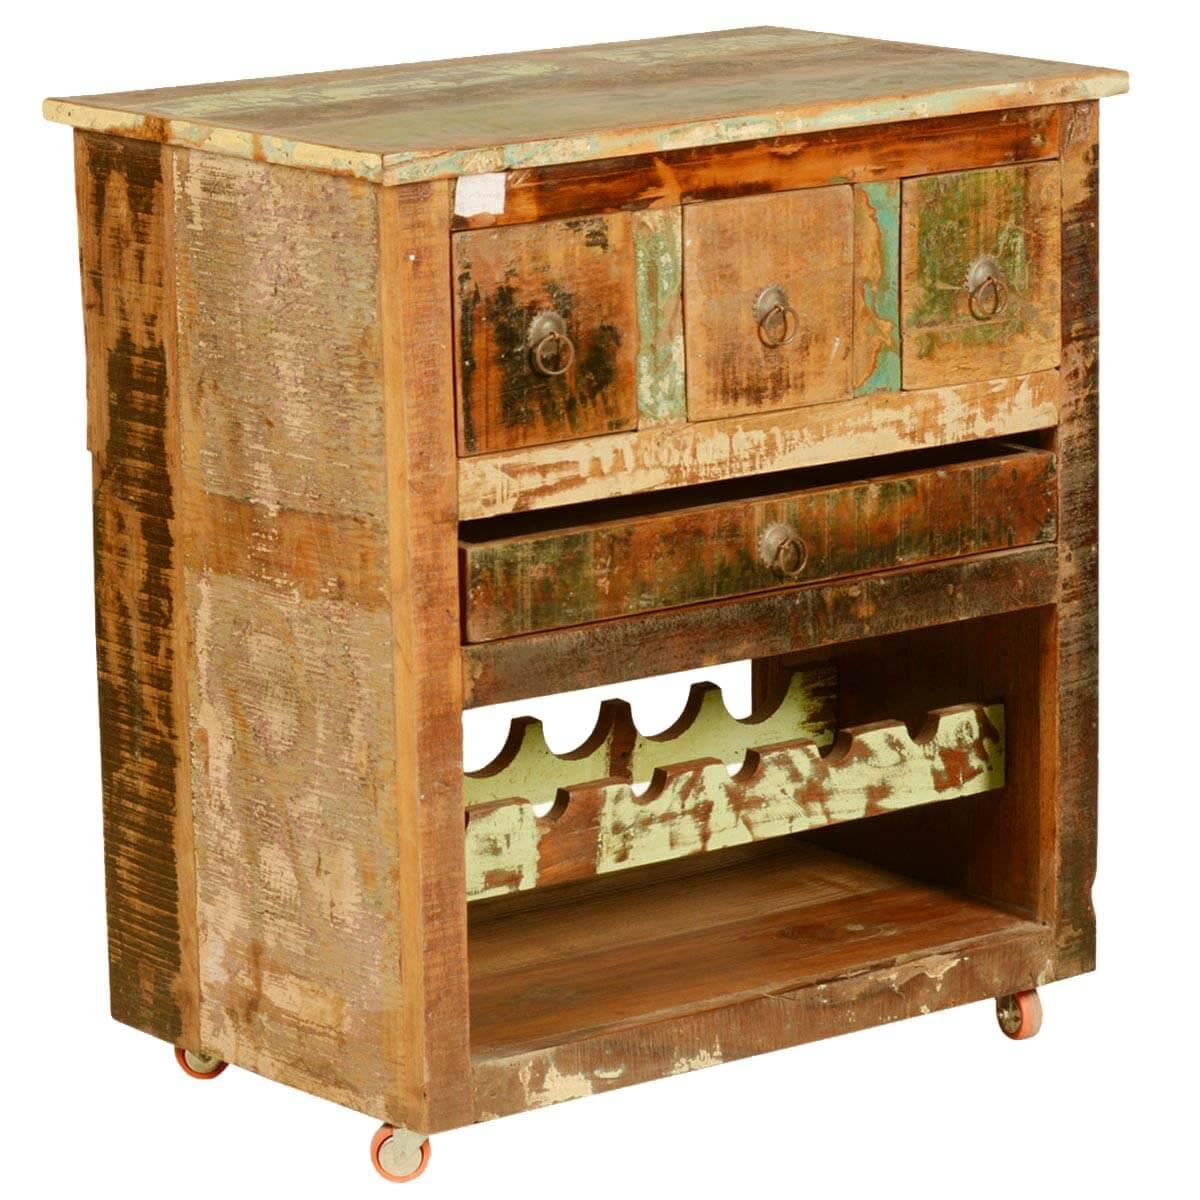 Merizo Rustic Reclaimed Wood Rolling Wheel Bar Cabinet